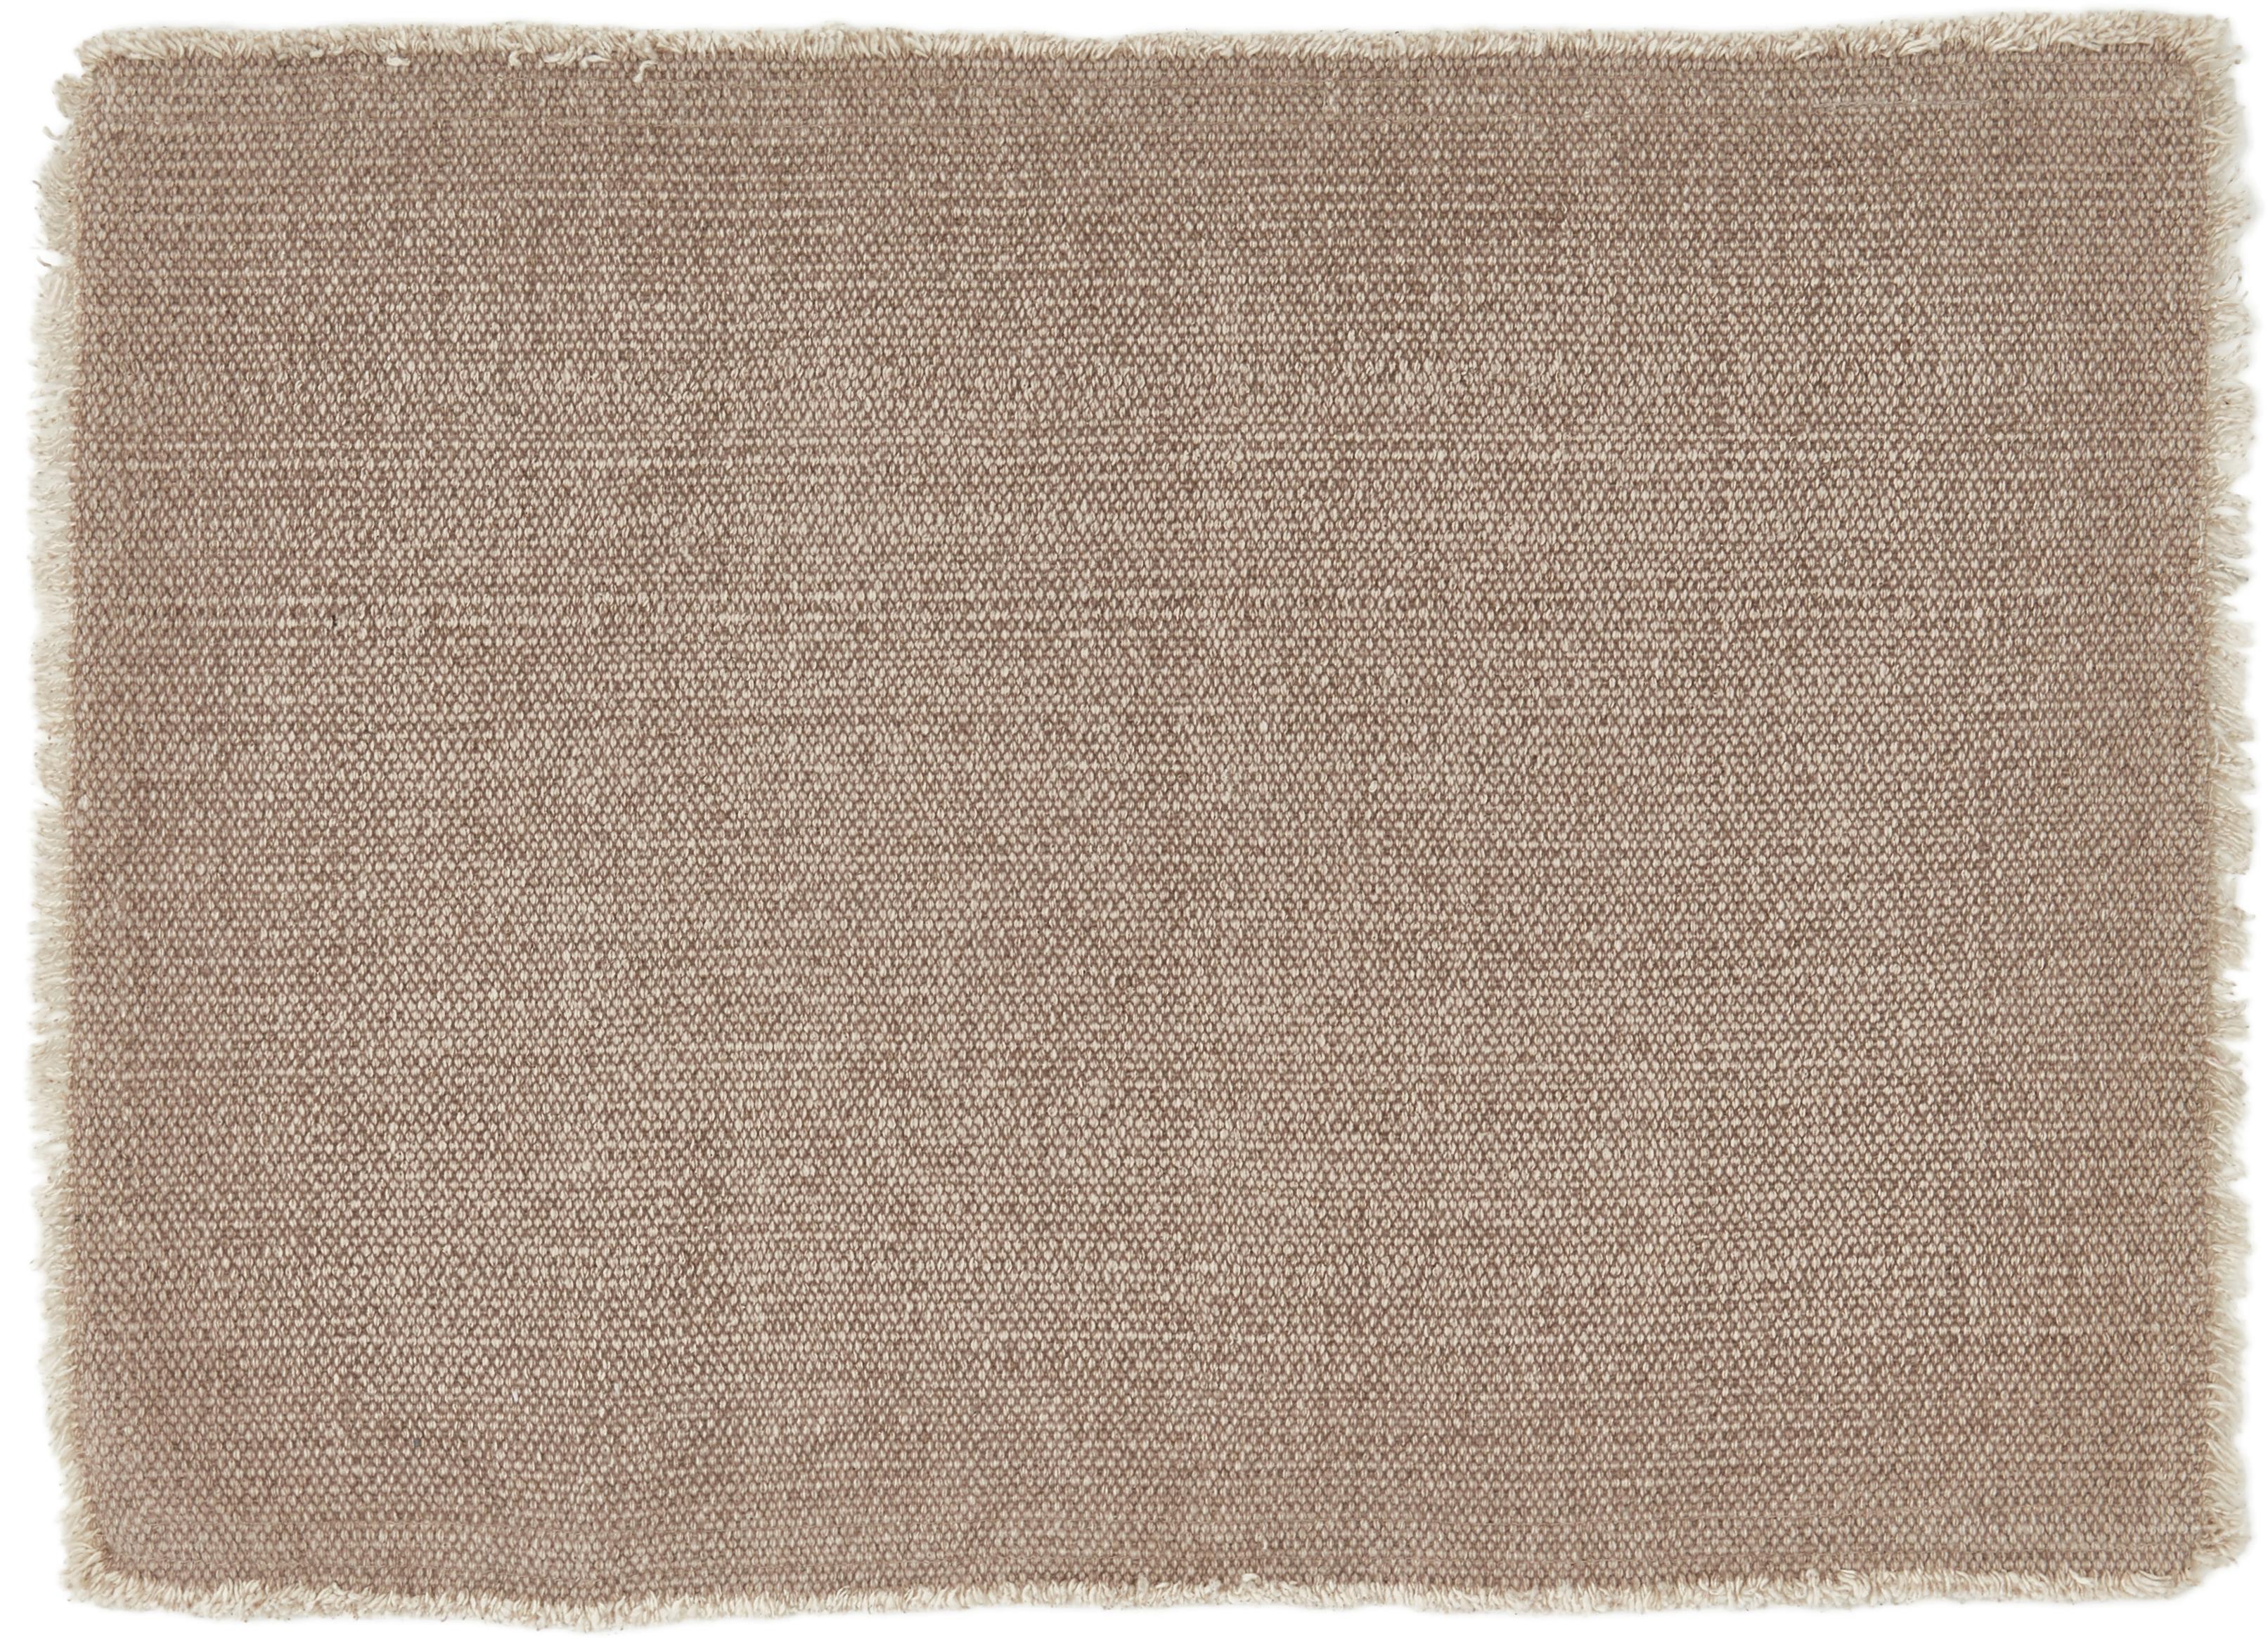 Manteles individuales Edge, 6uds., 85%algodón, 15%fibras mixtas, Gris, An 33 x L 48 cm